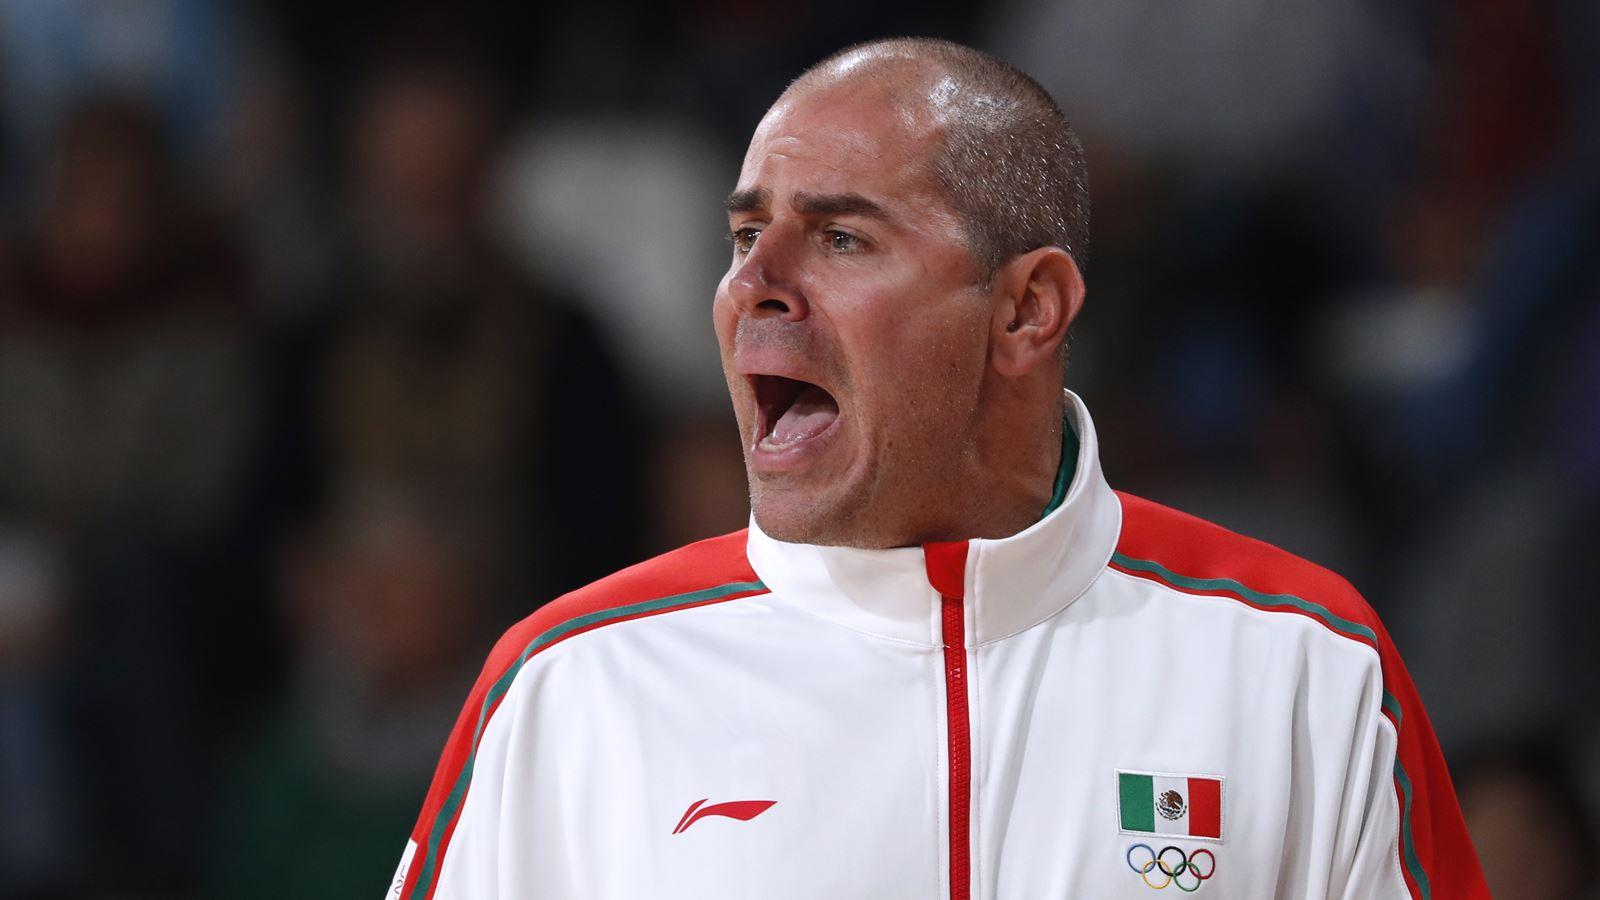 Entrenador de Selección Mexicana de Basquetbol renuncia por falta de apoyo